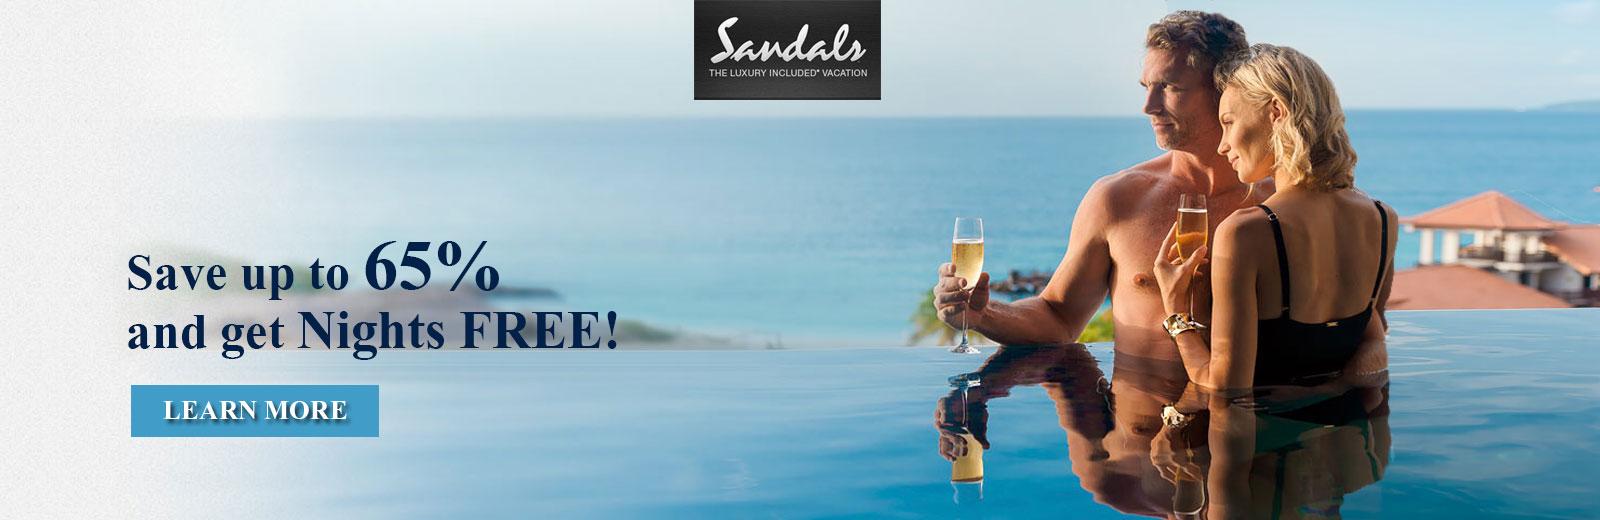 SandalResorts